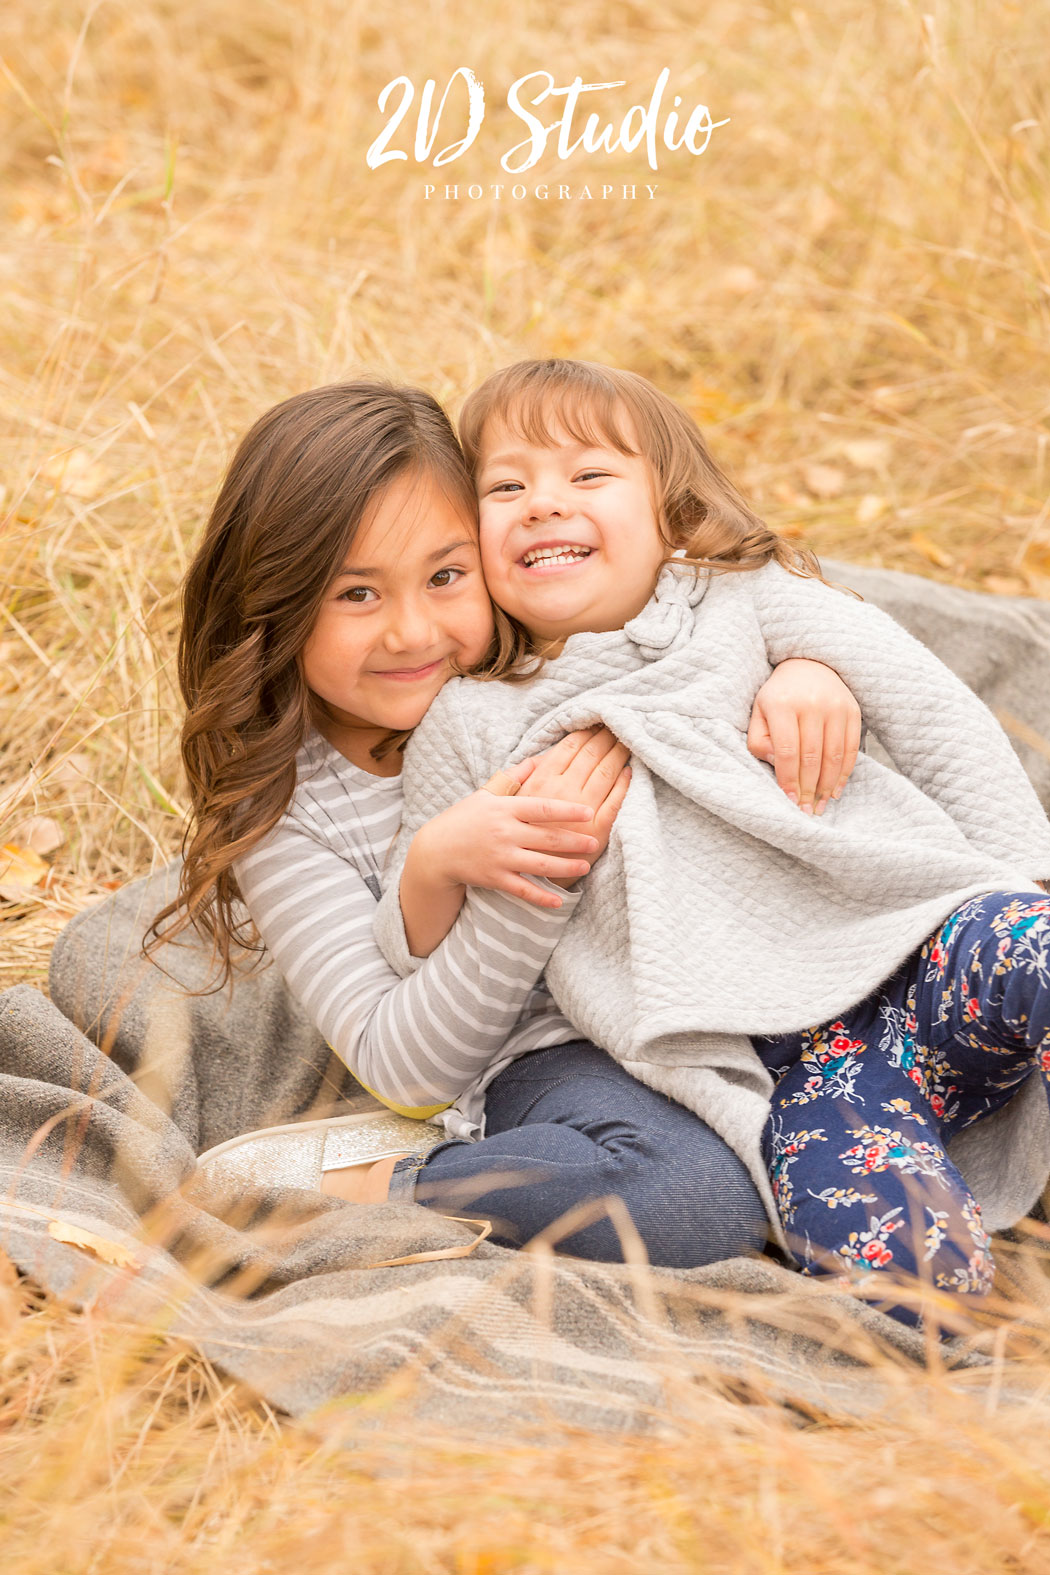 Child Photographer Lethbridge